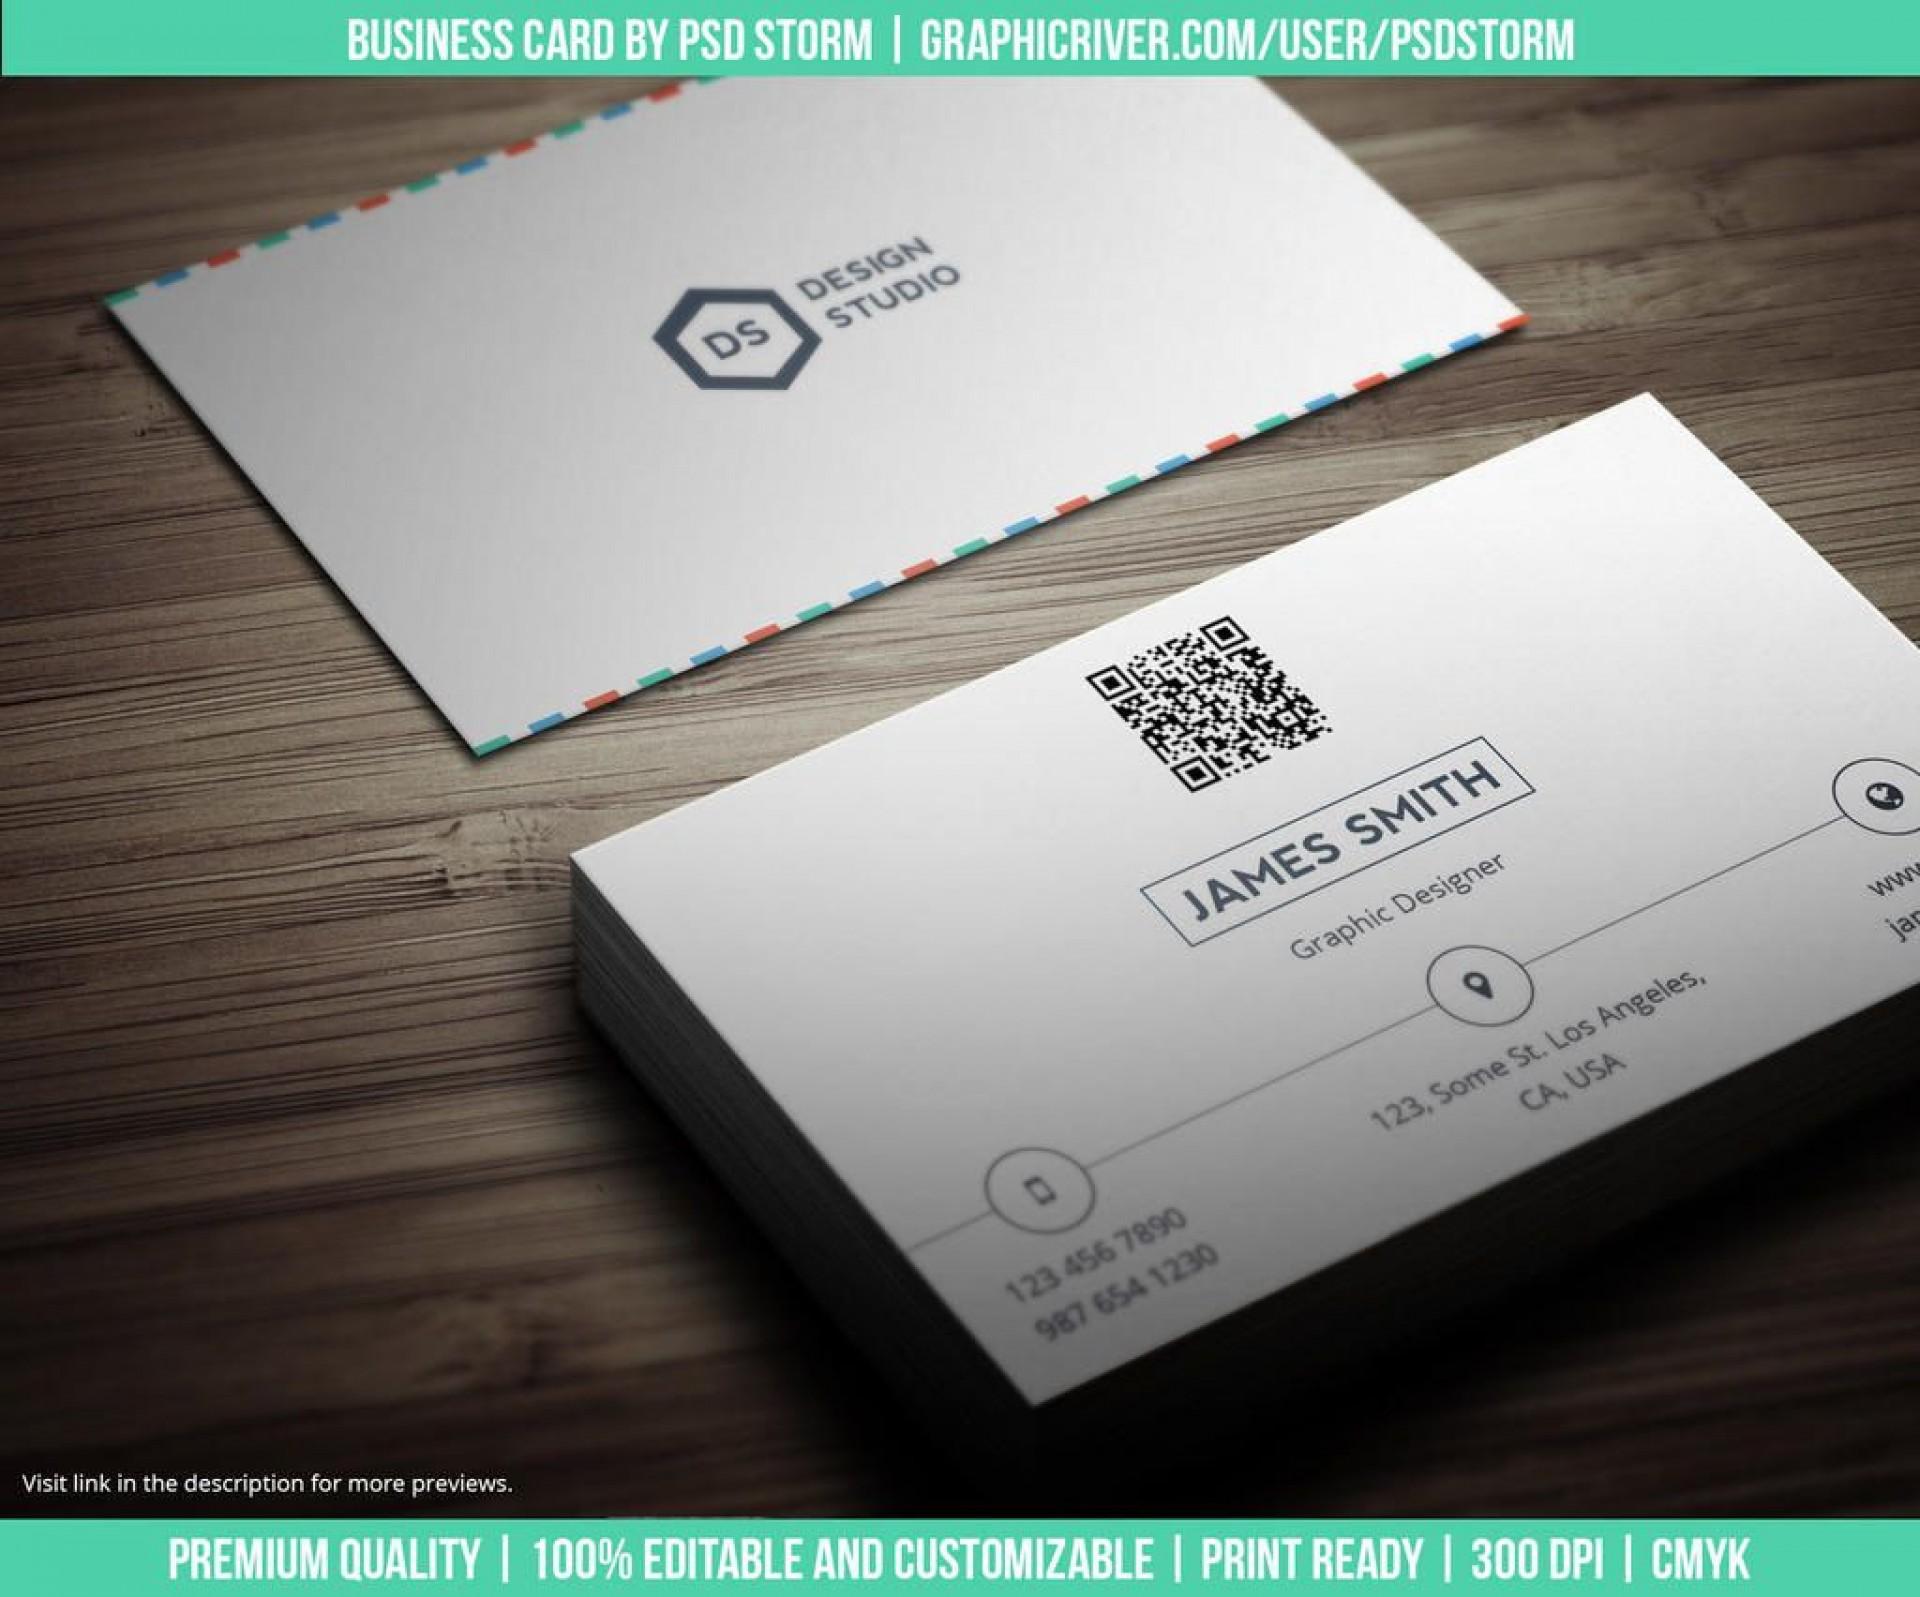 005 Simple Minimalist Busines Card Template Psd High Resolution 1920